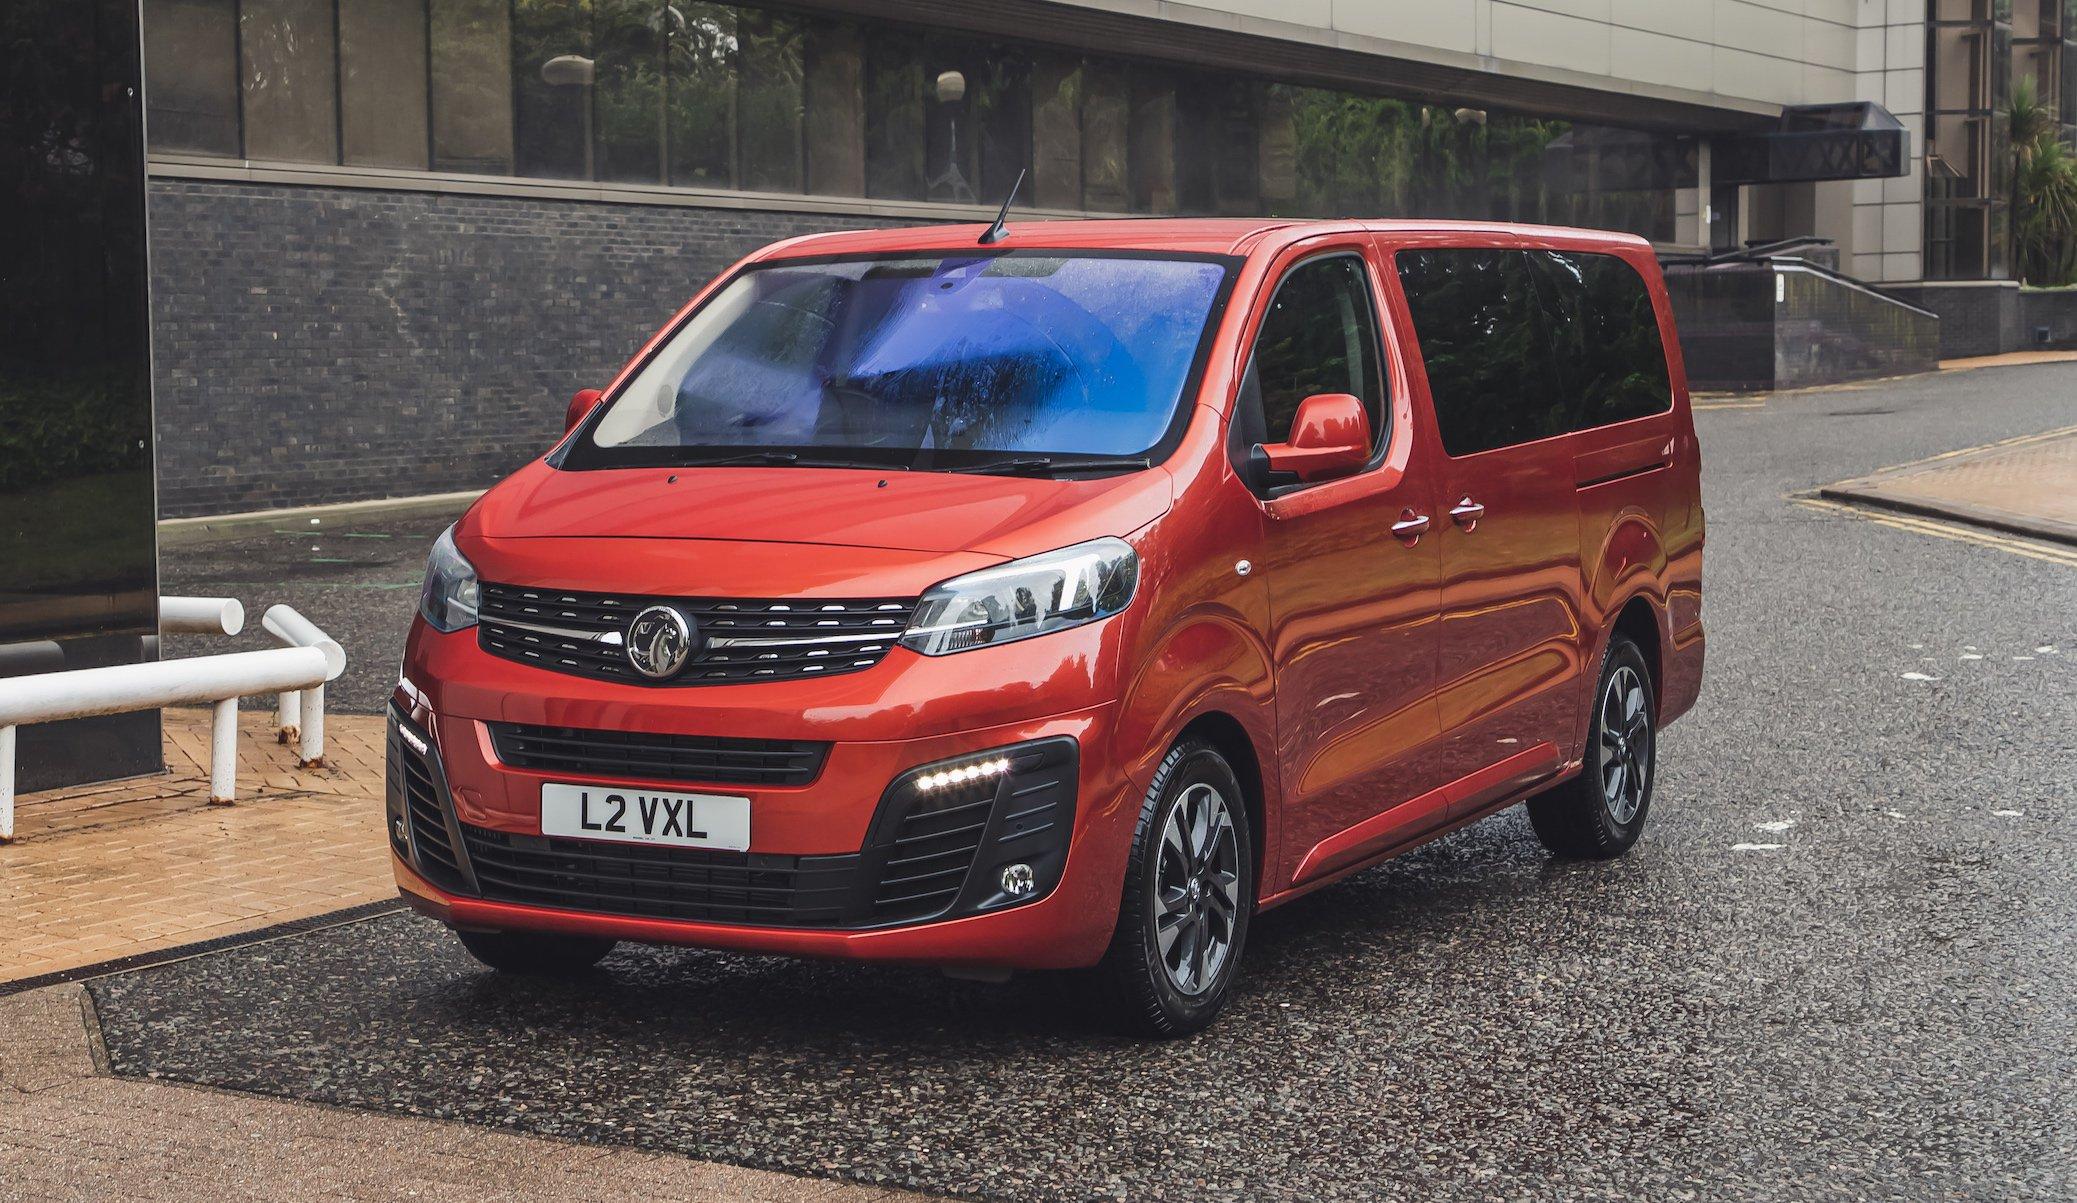 big sale classic buy good 2019 Vauxhall Vivaro Life verdict | What Car?